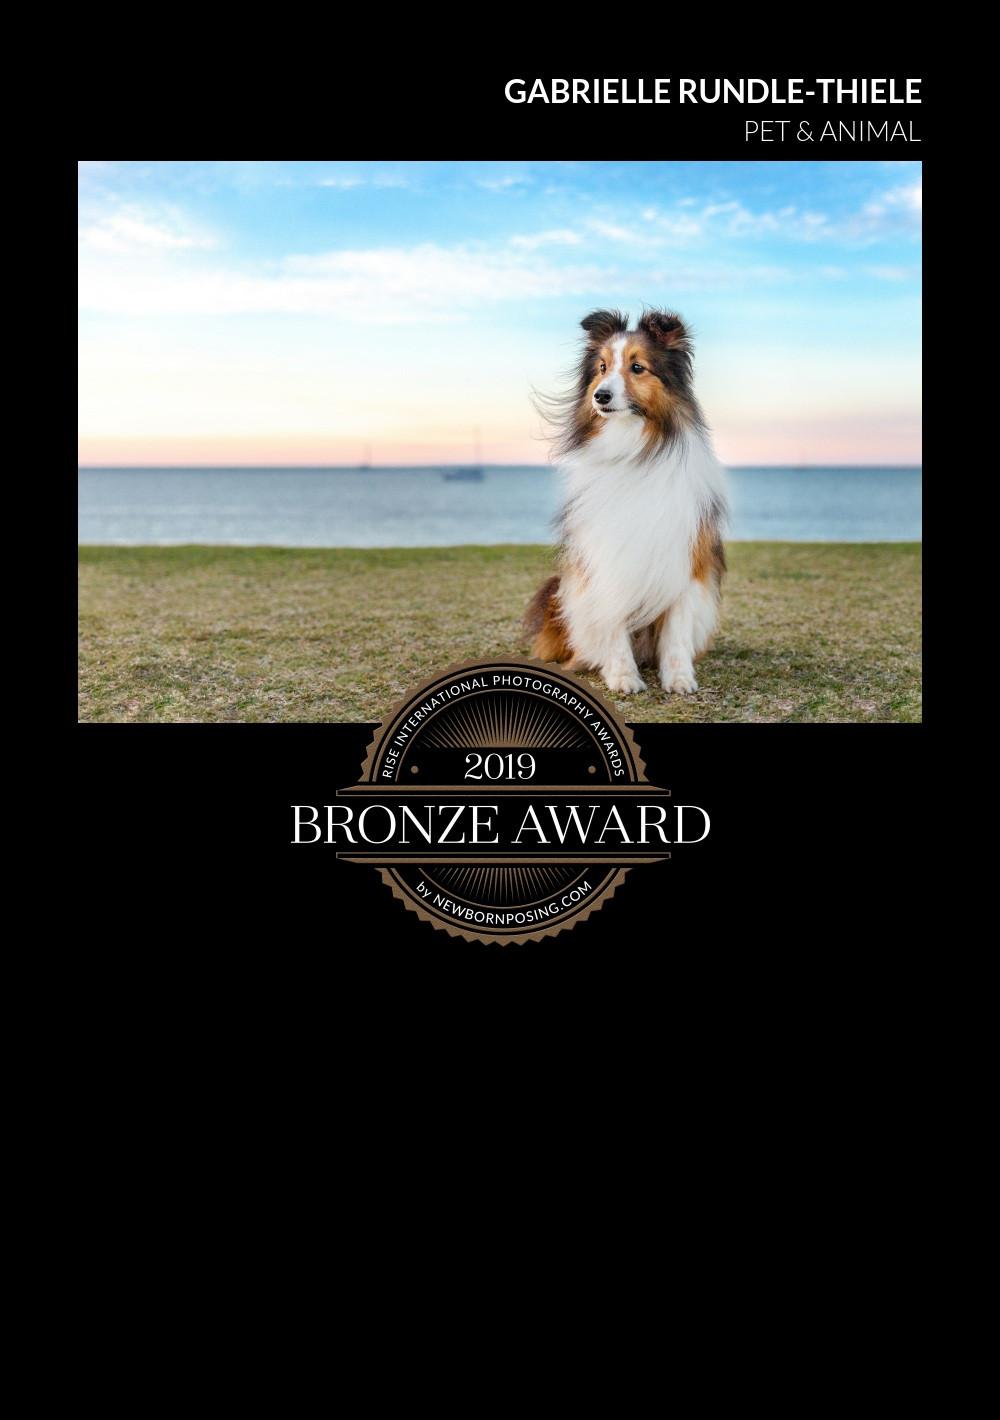 Tails of Time's Bronze award image // award winning pet photography